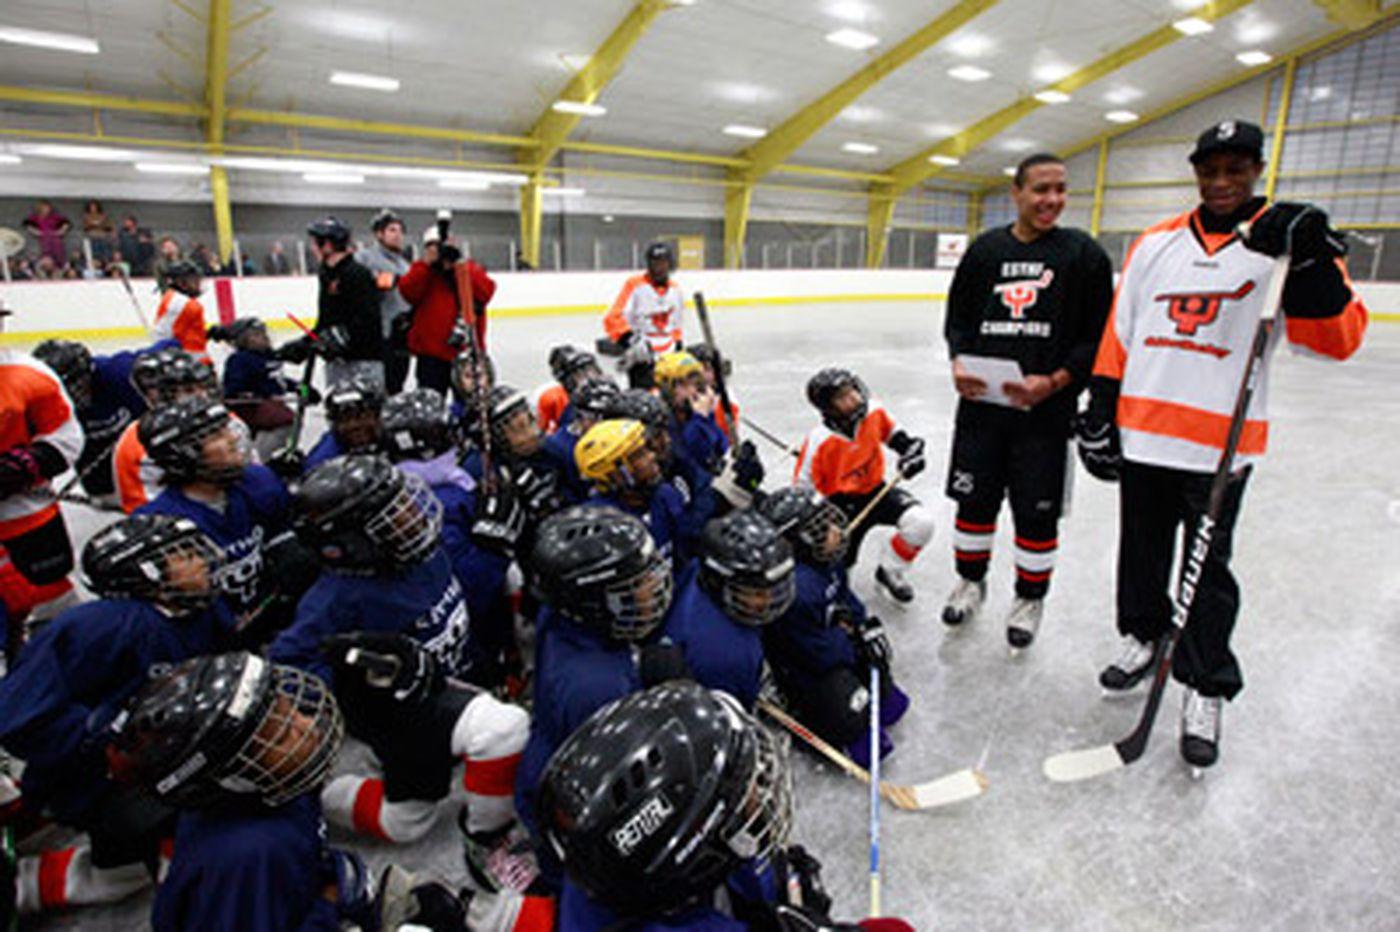 Hockey helps youths skate a straight line